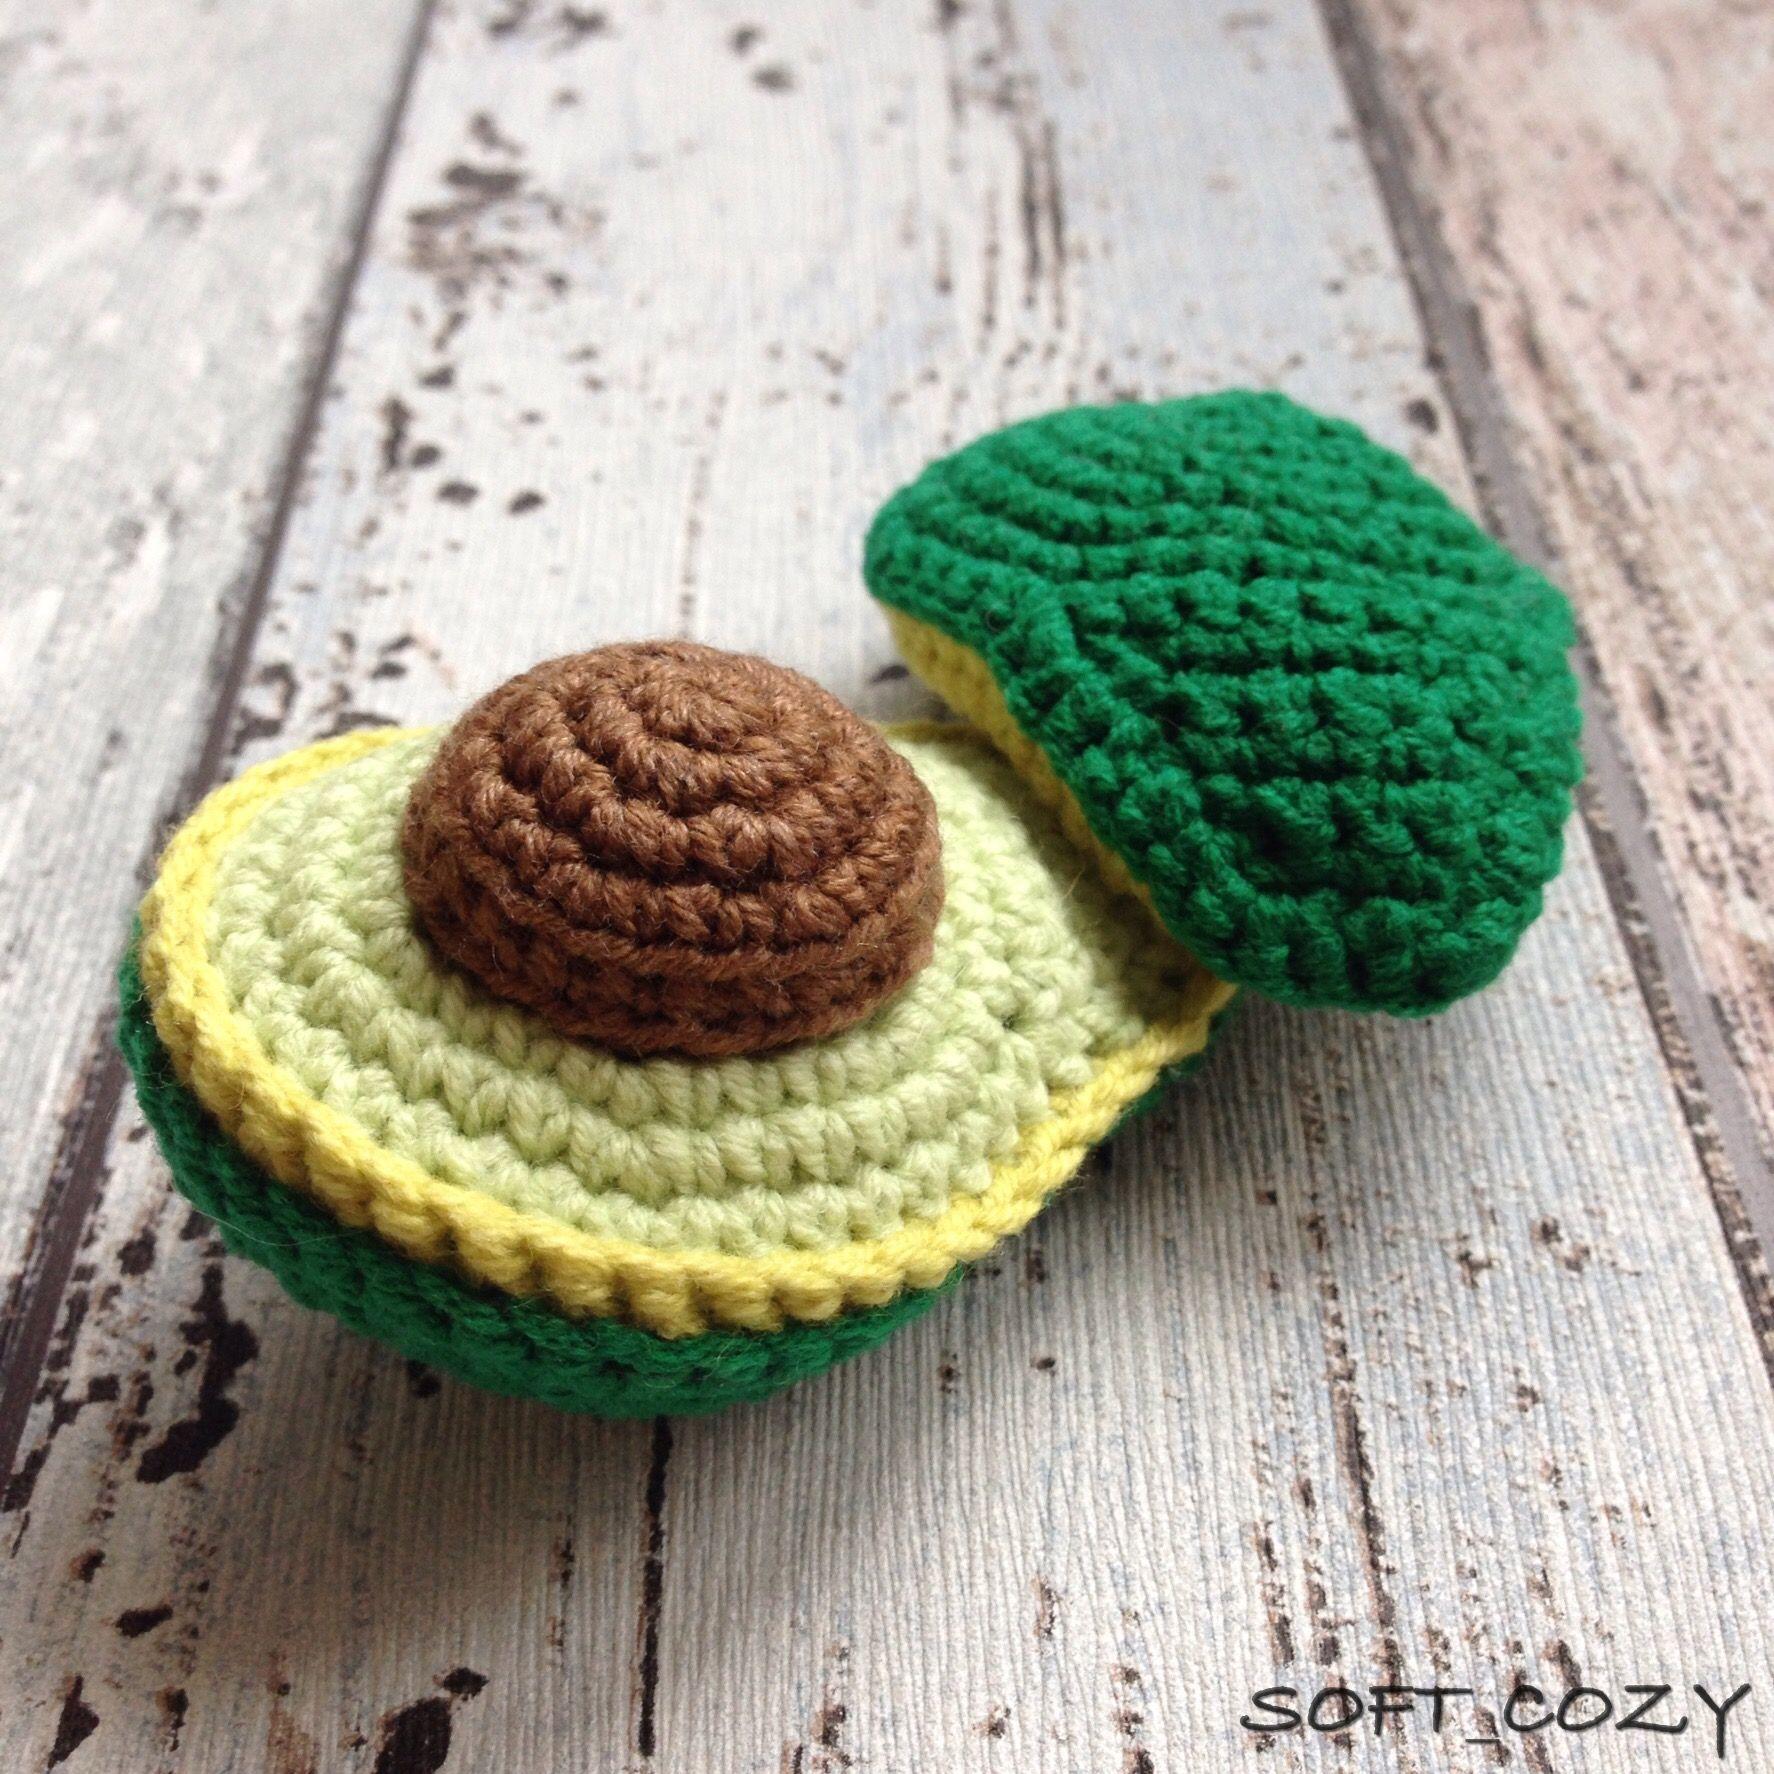 Avocado Crochet Pattern | Crochet, Knitting, Sewing, Quilting ...